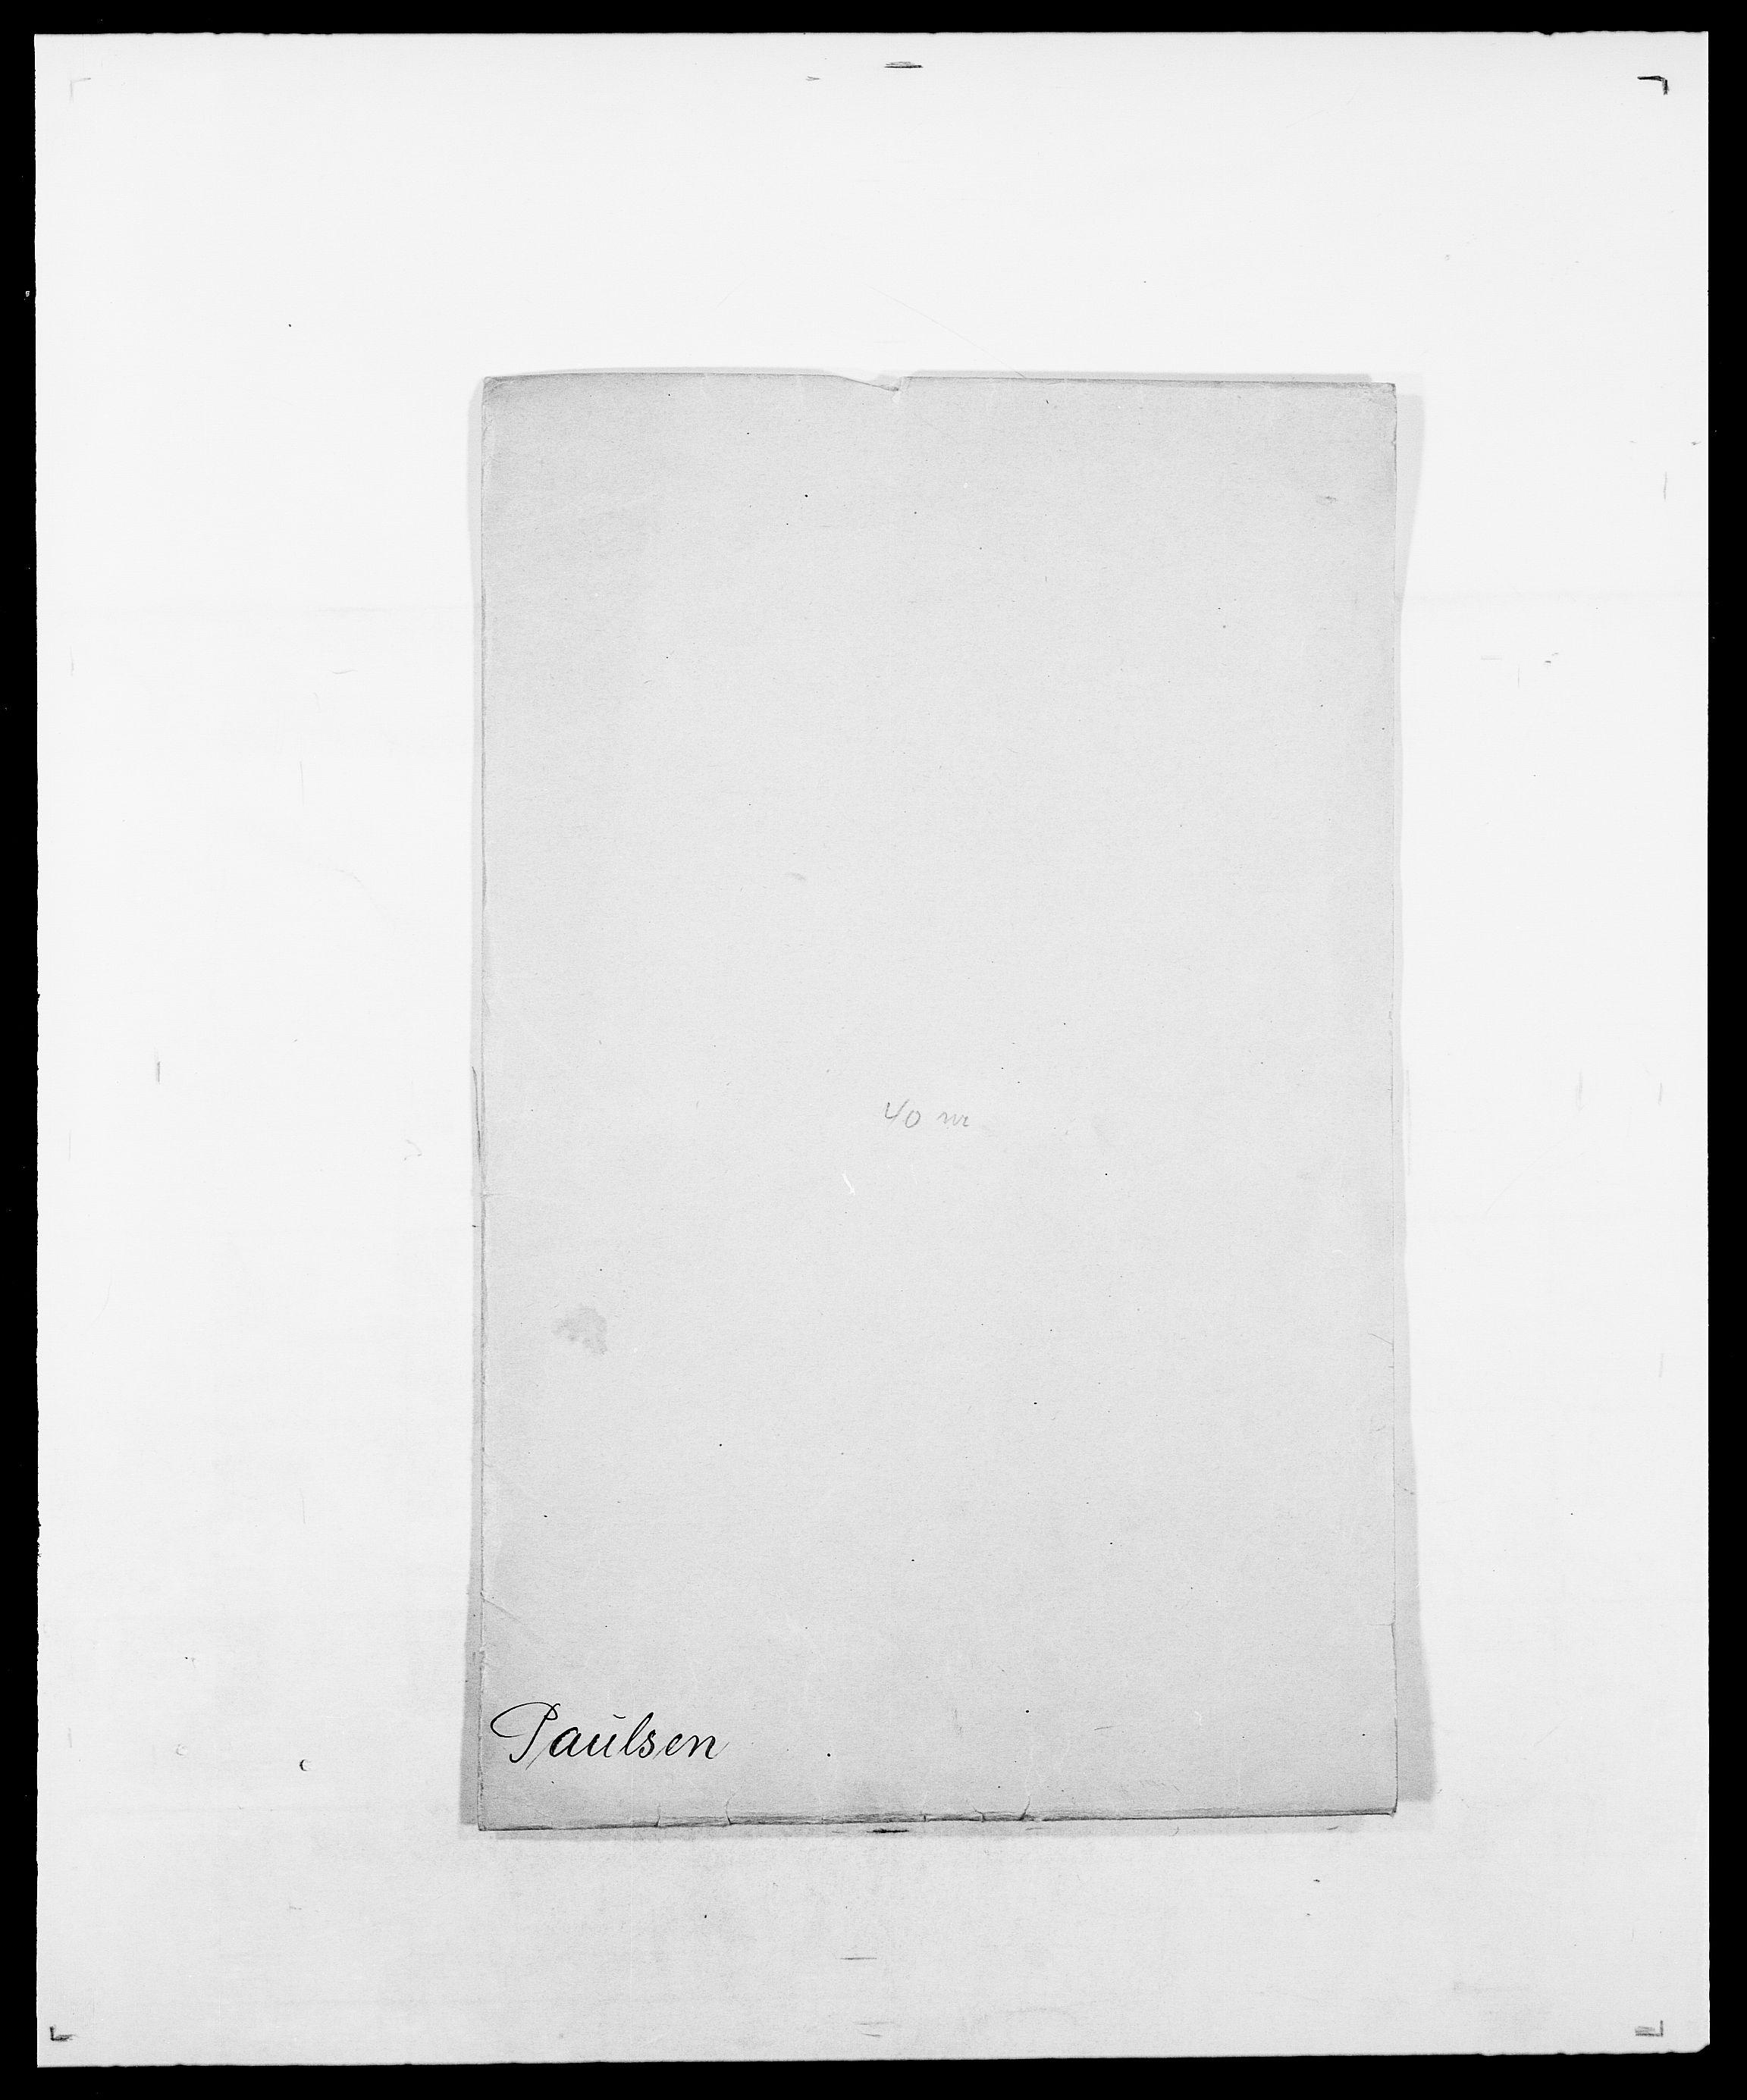 SAO, Delgobe, Charles Antoine - samling, D/Da/L0030: Paars - Pittelkov, s. 154